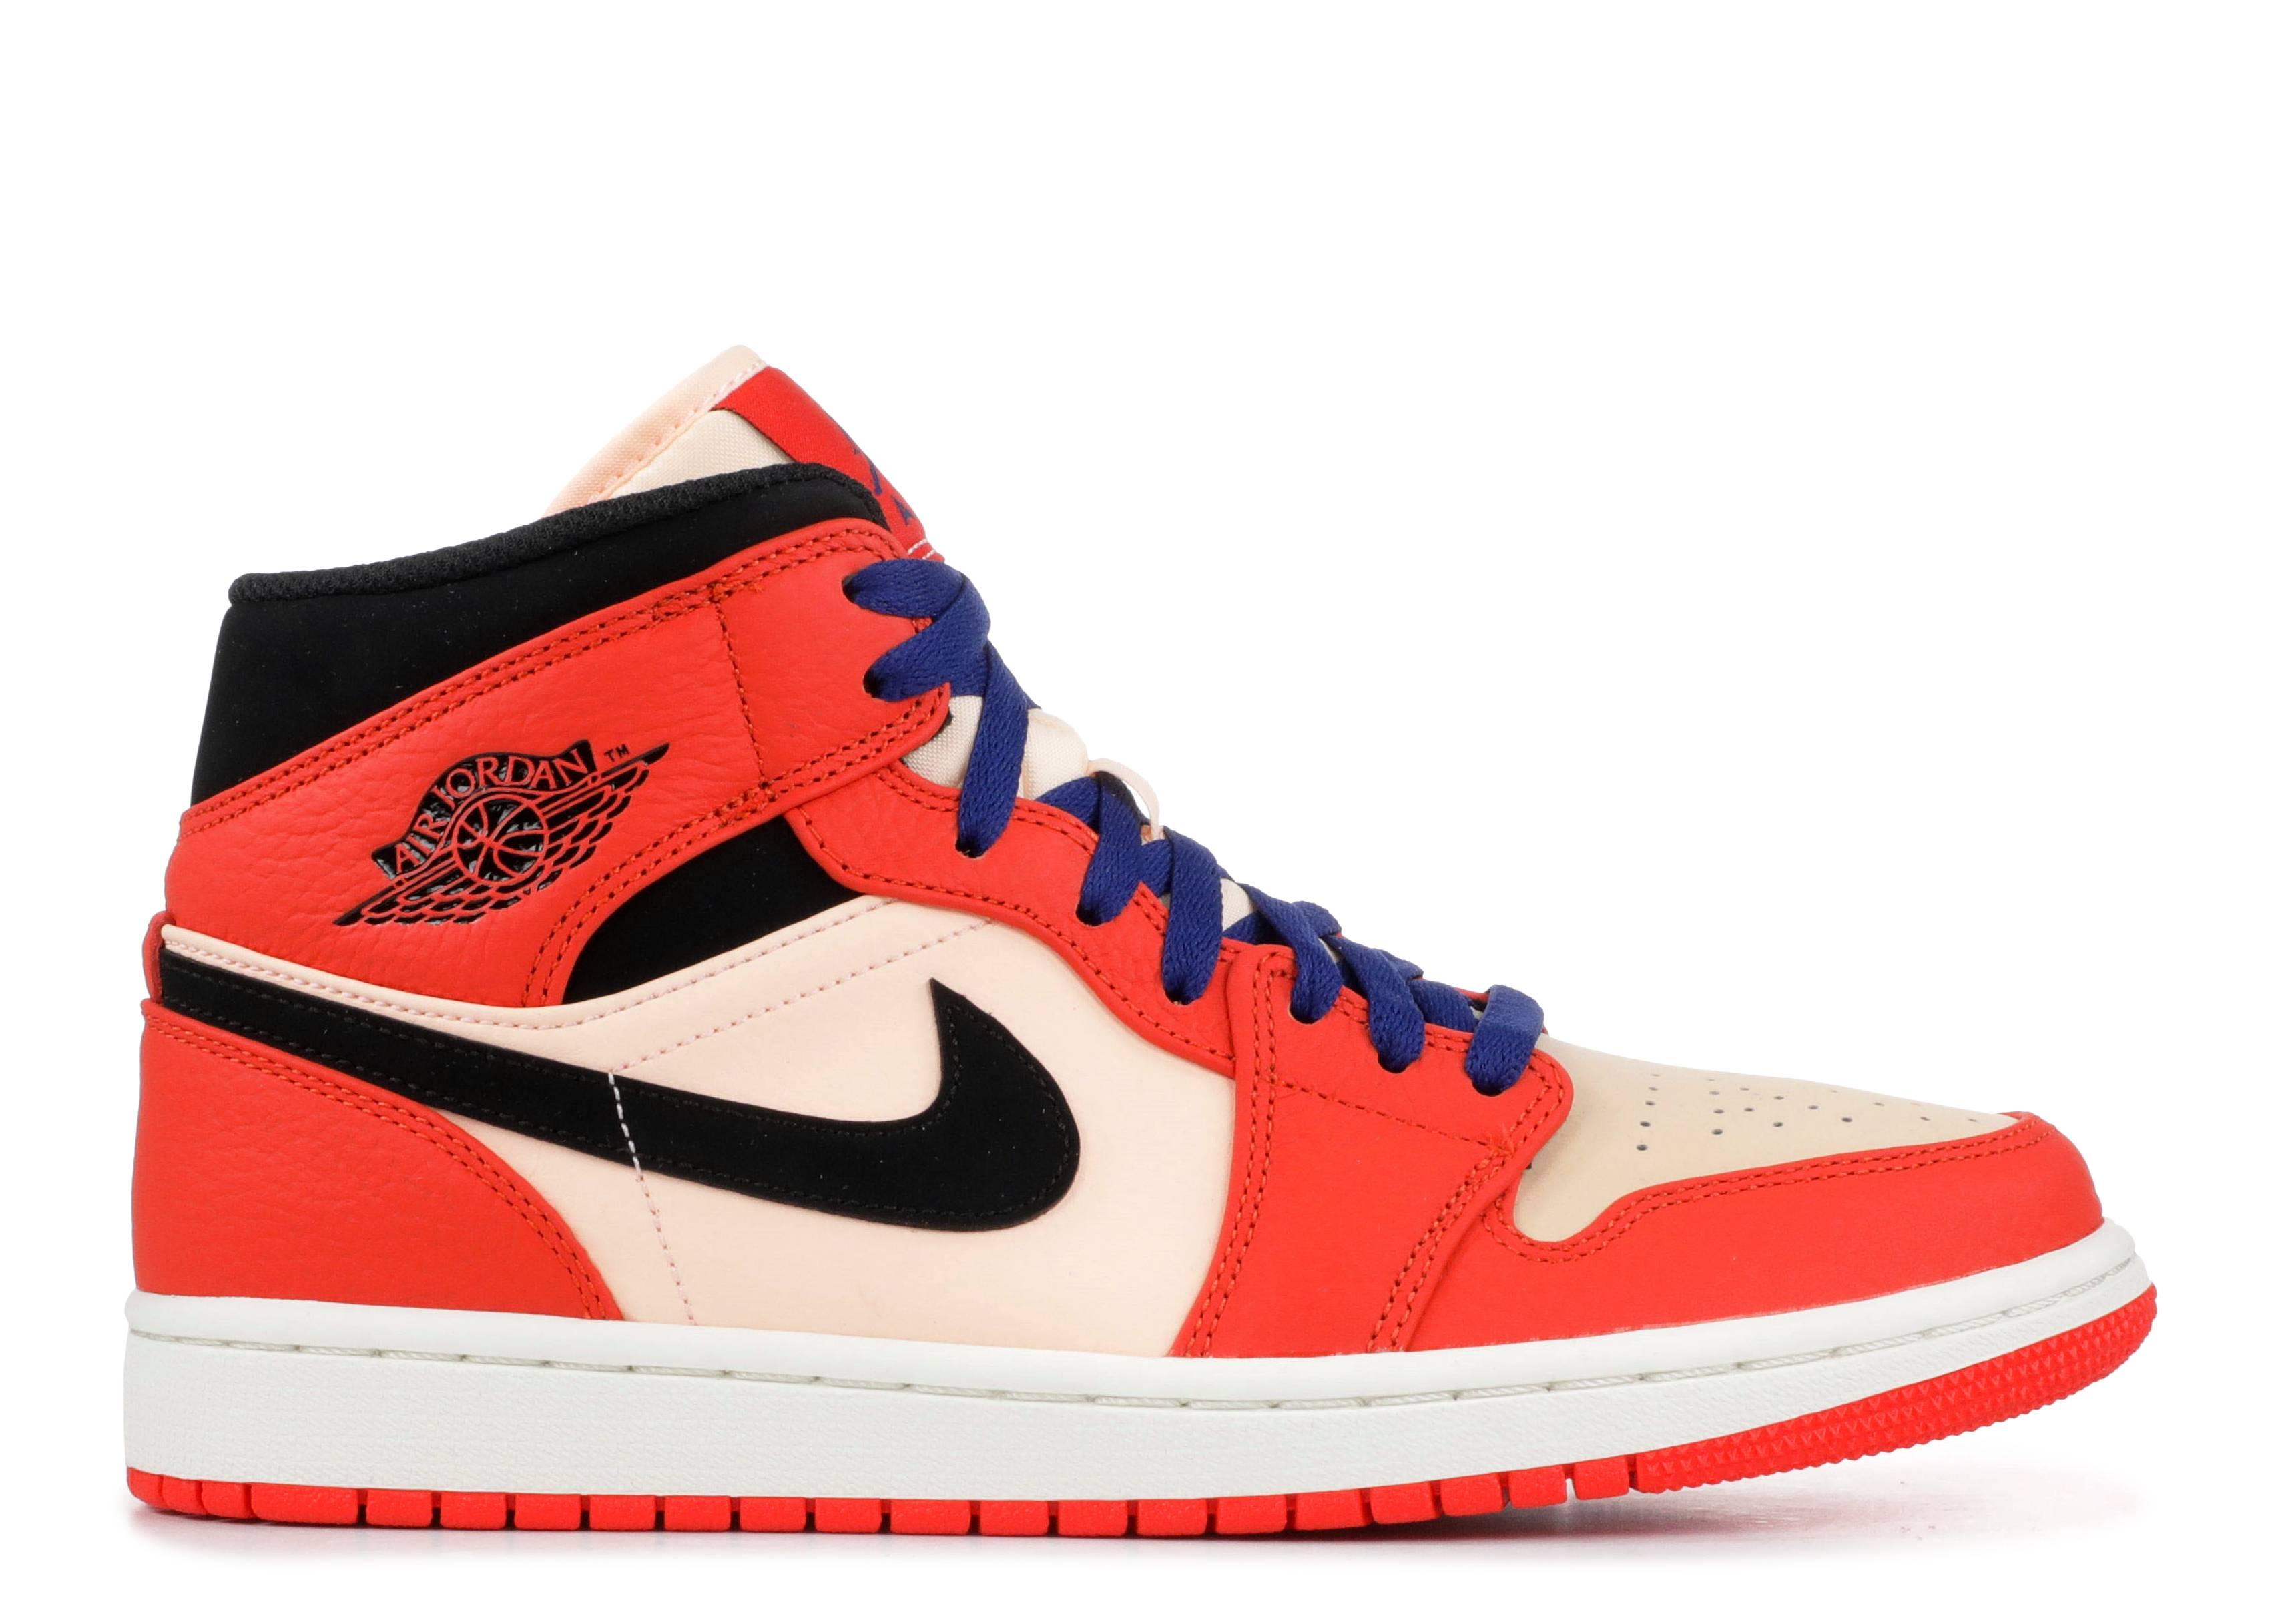 arrives 4e313 8fd59 Air Jordan 1 (I) Shoes - Nike | Flight Club